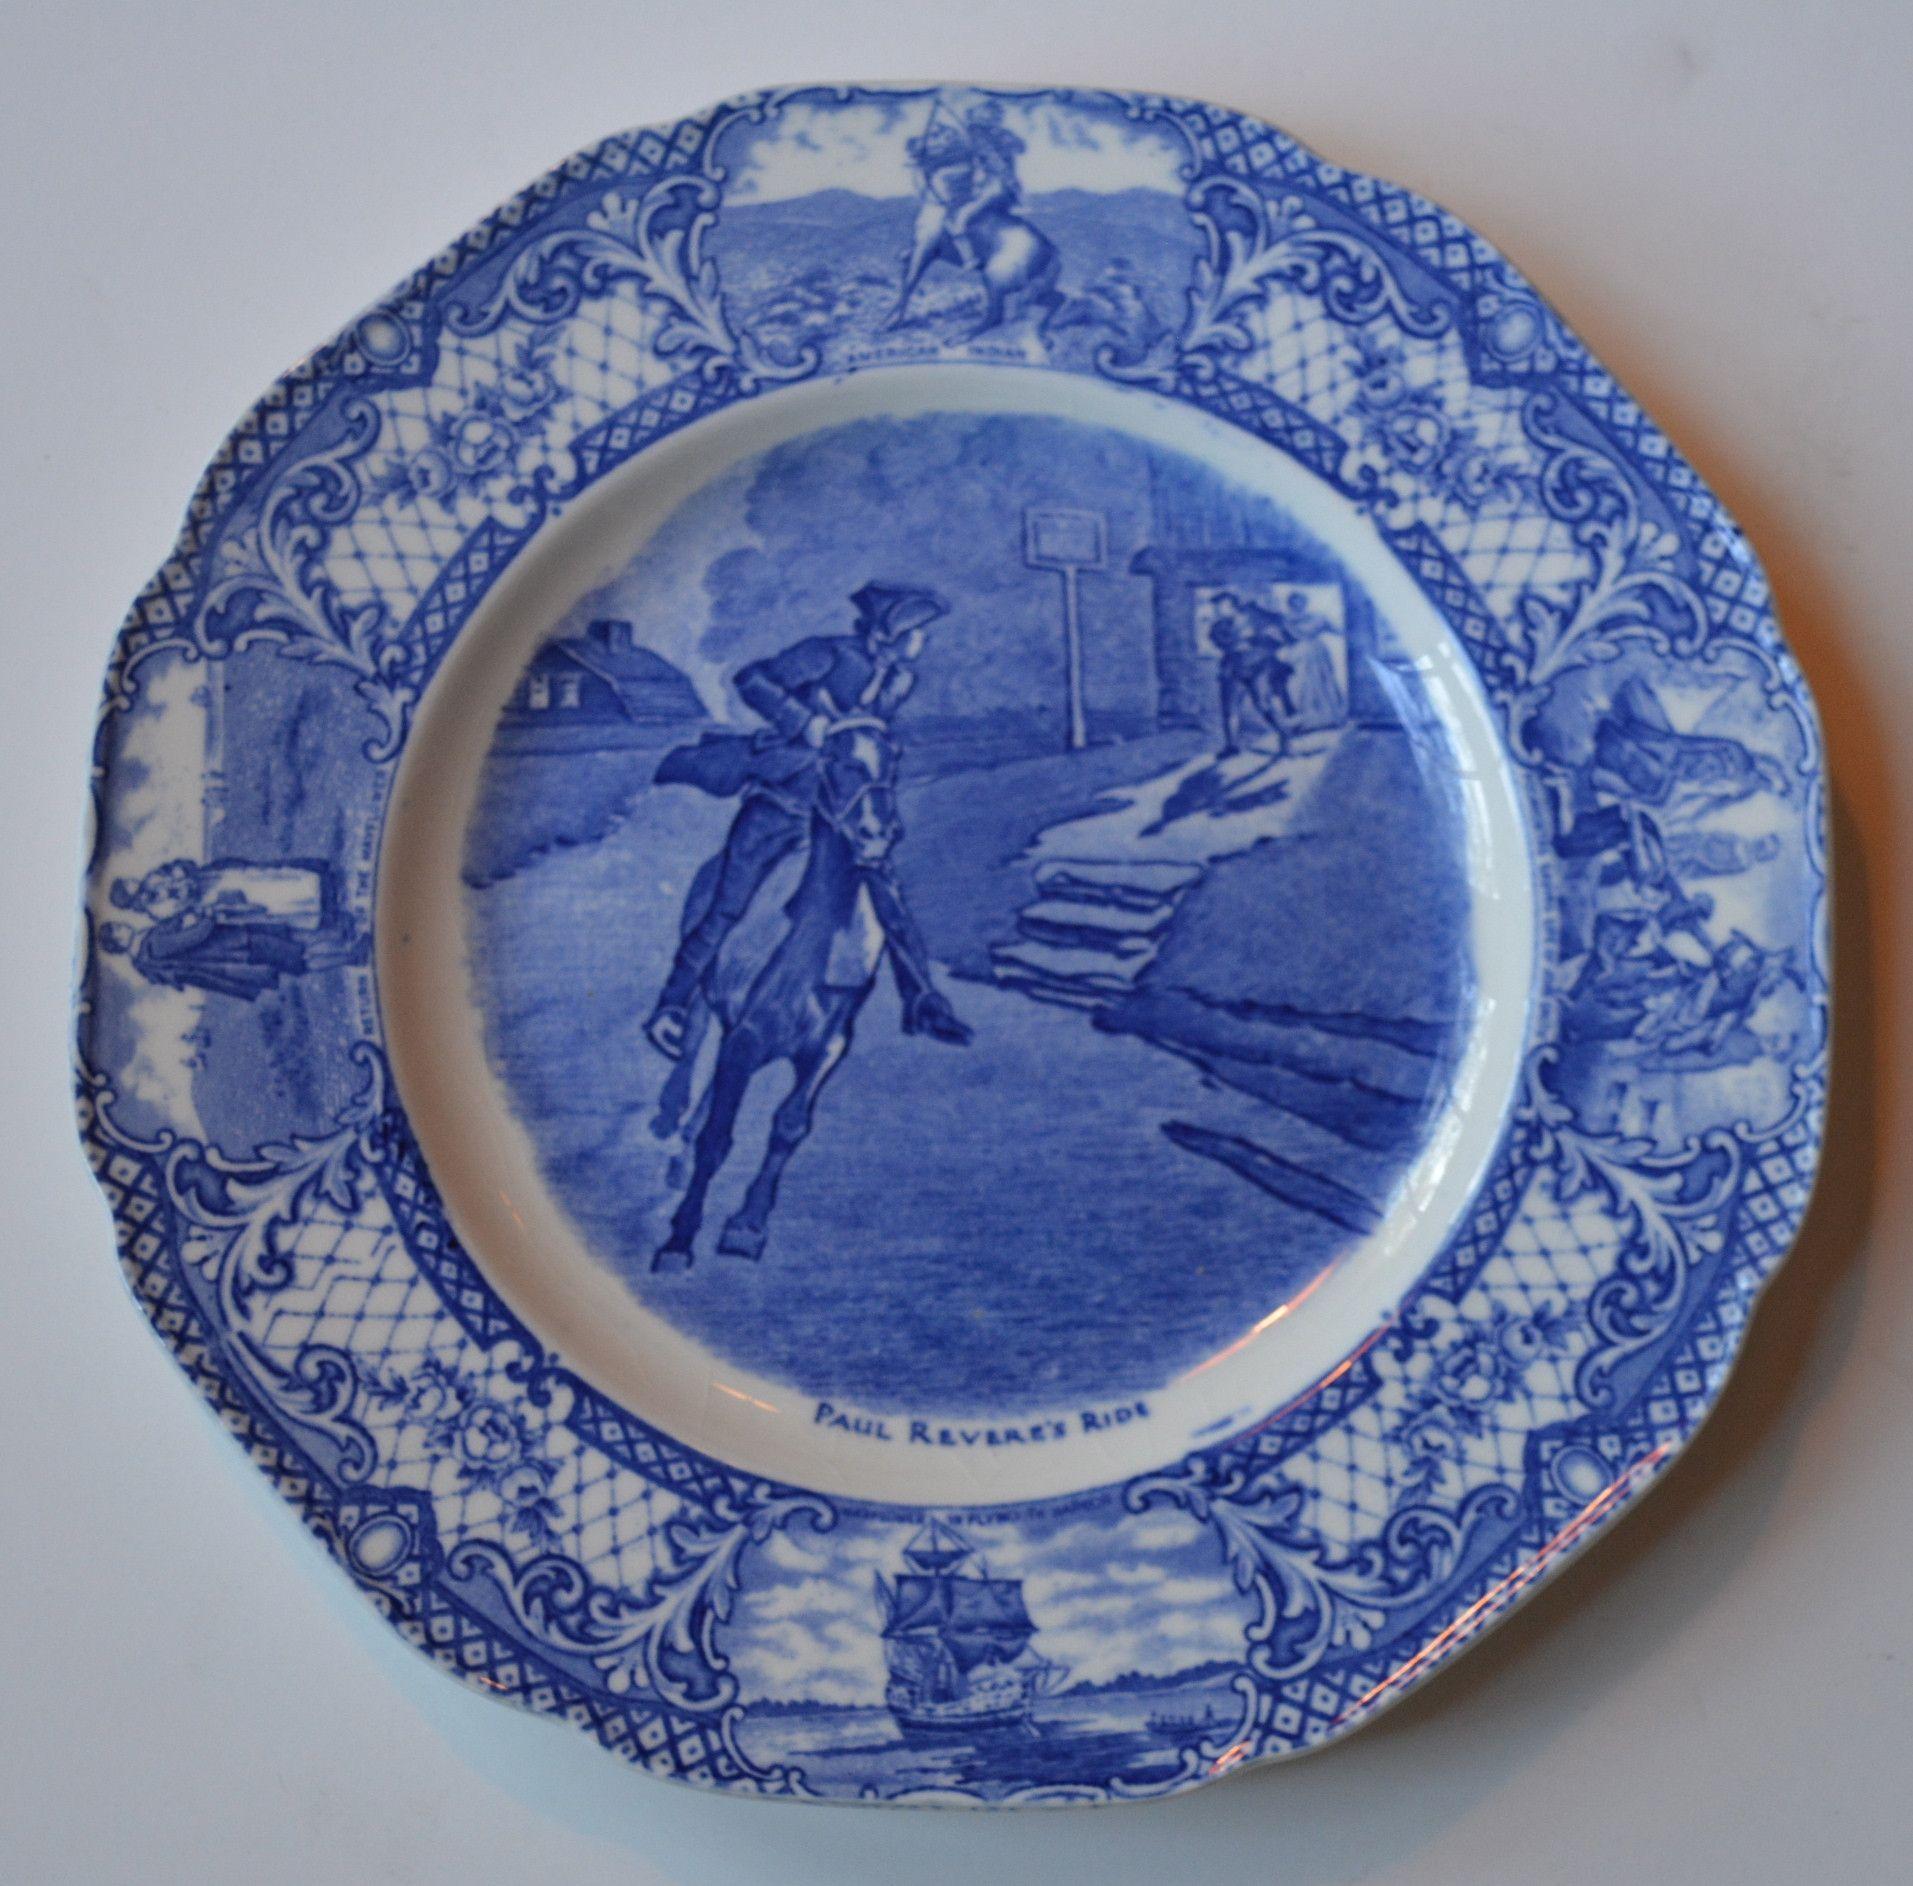 Blue Colonial Times Transferware Plate Paul Revere S Ride